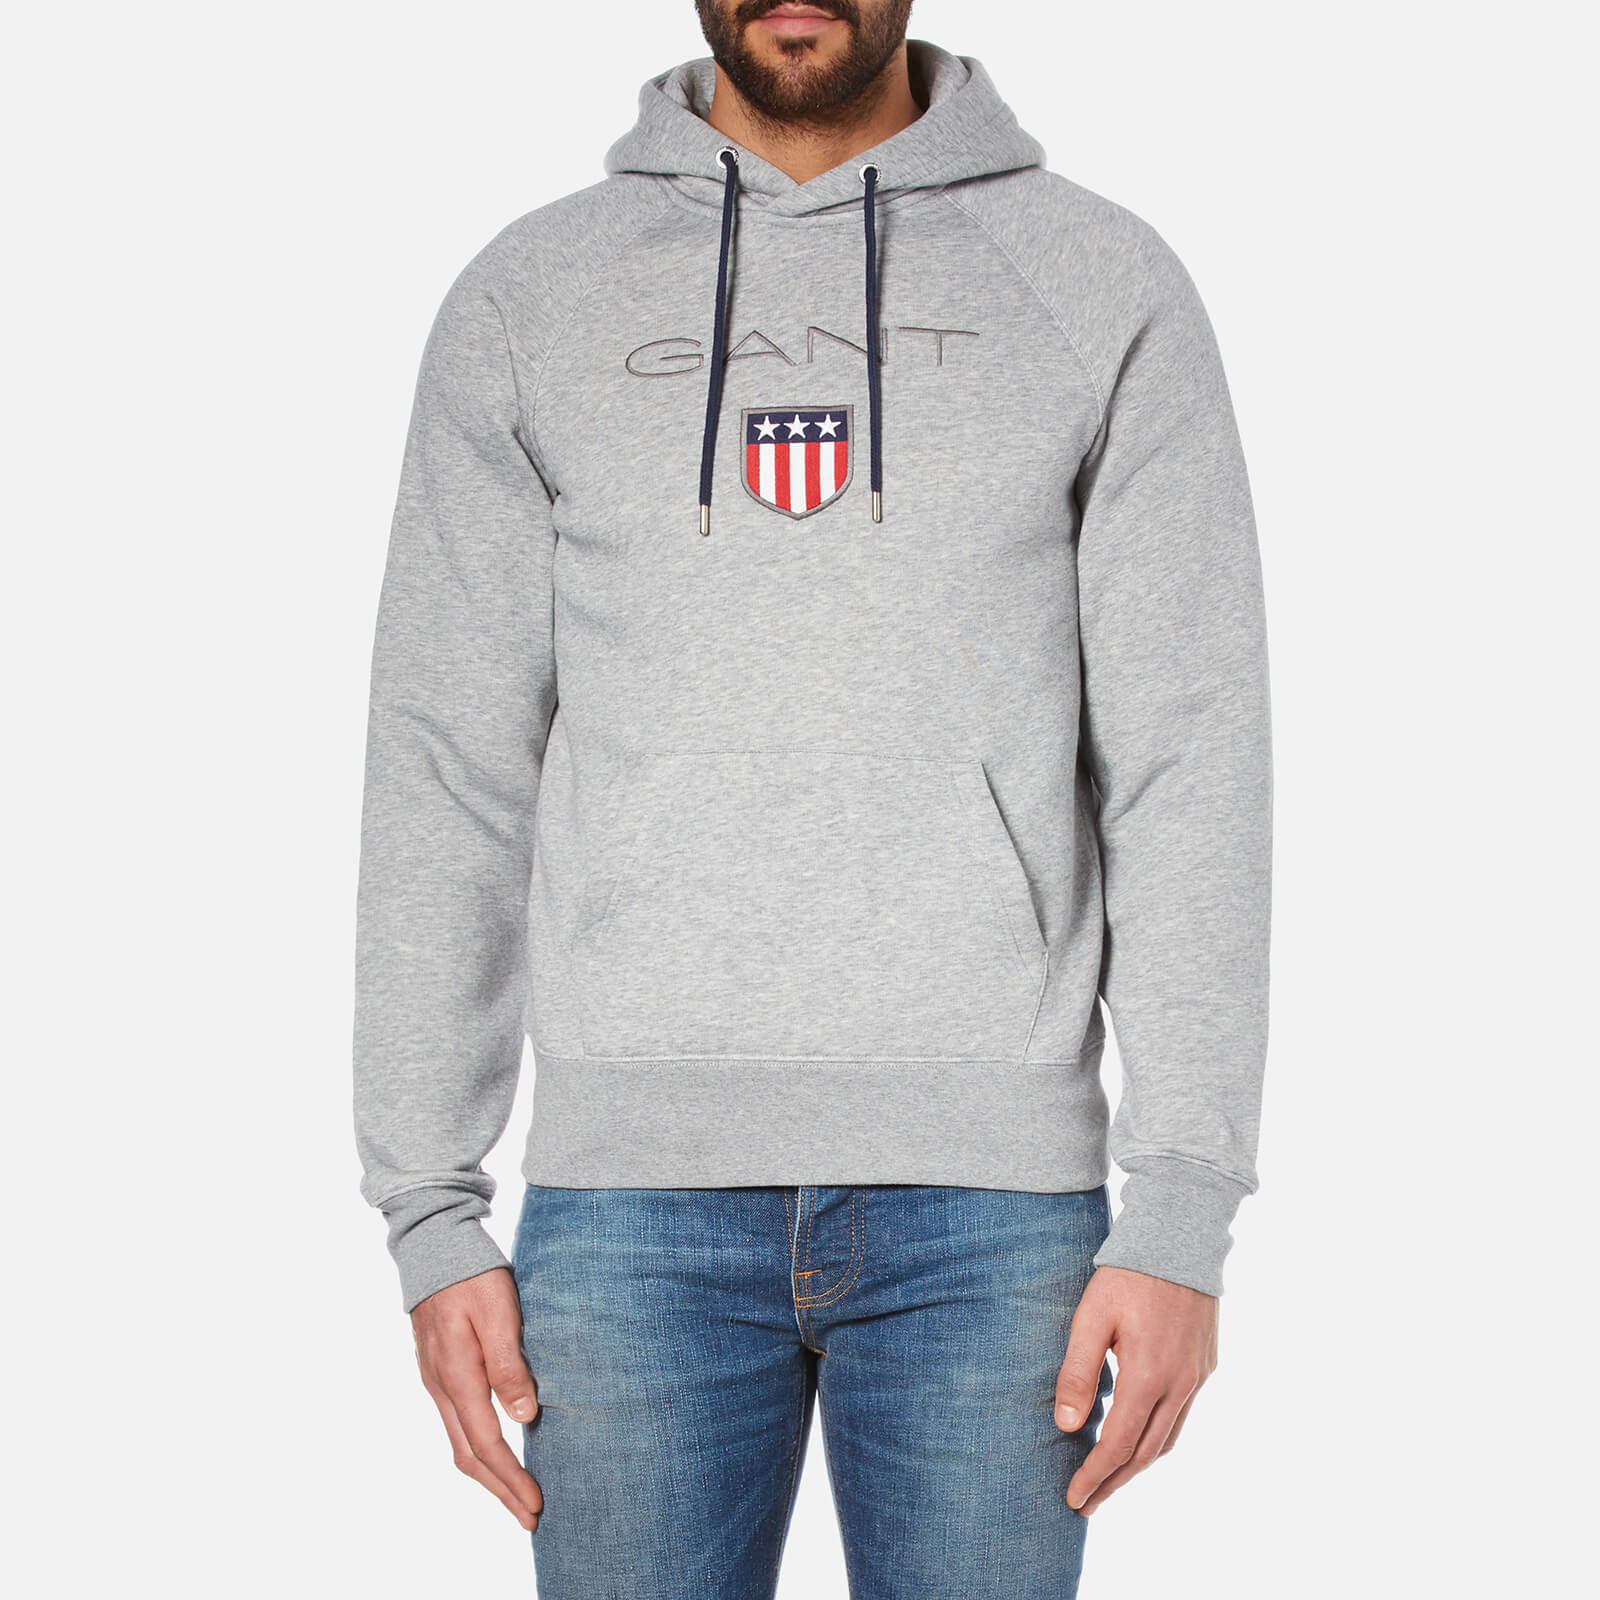 5718118d GANT Men's GANT Shield Hoodie - Grey Melange Mens Clothing | TheHut.com